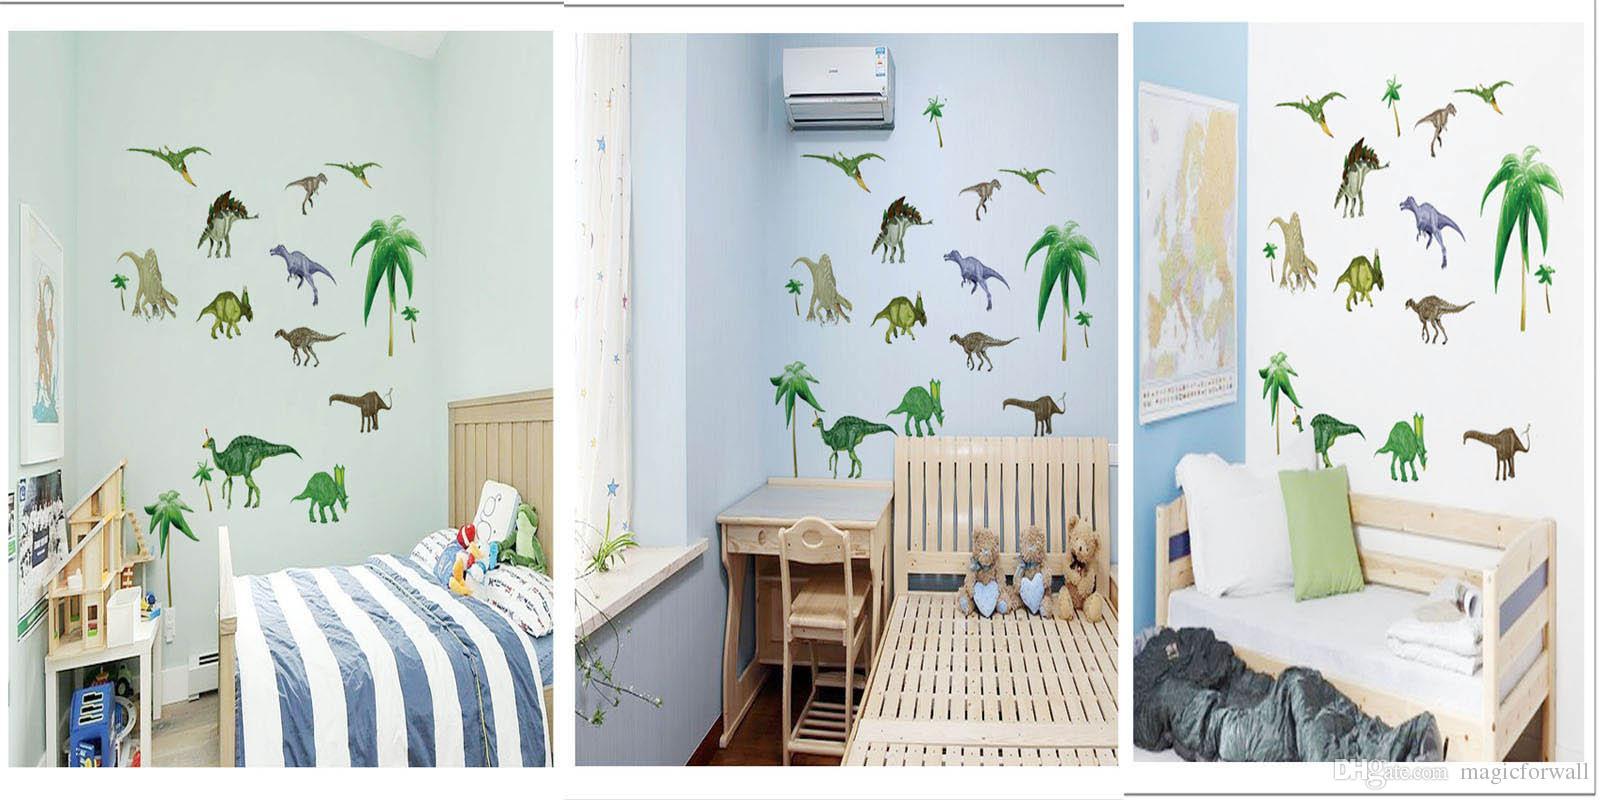 Full Size of Cartoon Tiere Wandkunst Aufkleber Fr Baby Sofa Regal Regale Weiß Kinderzimmer Kinderzimmer Pferd